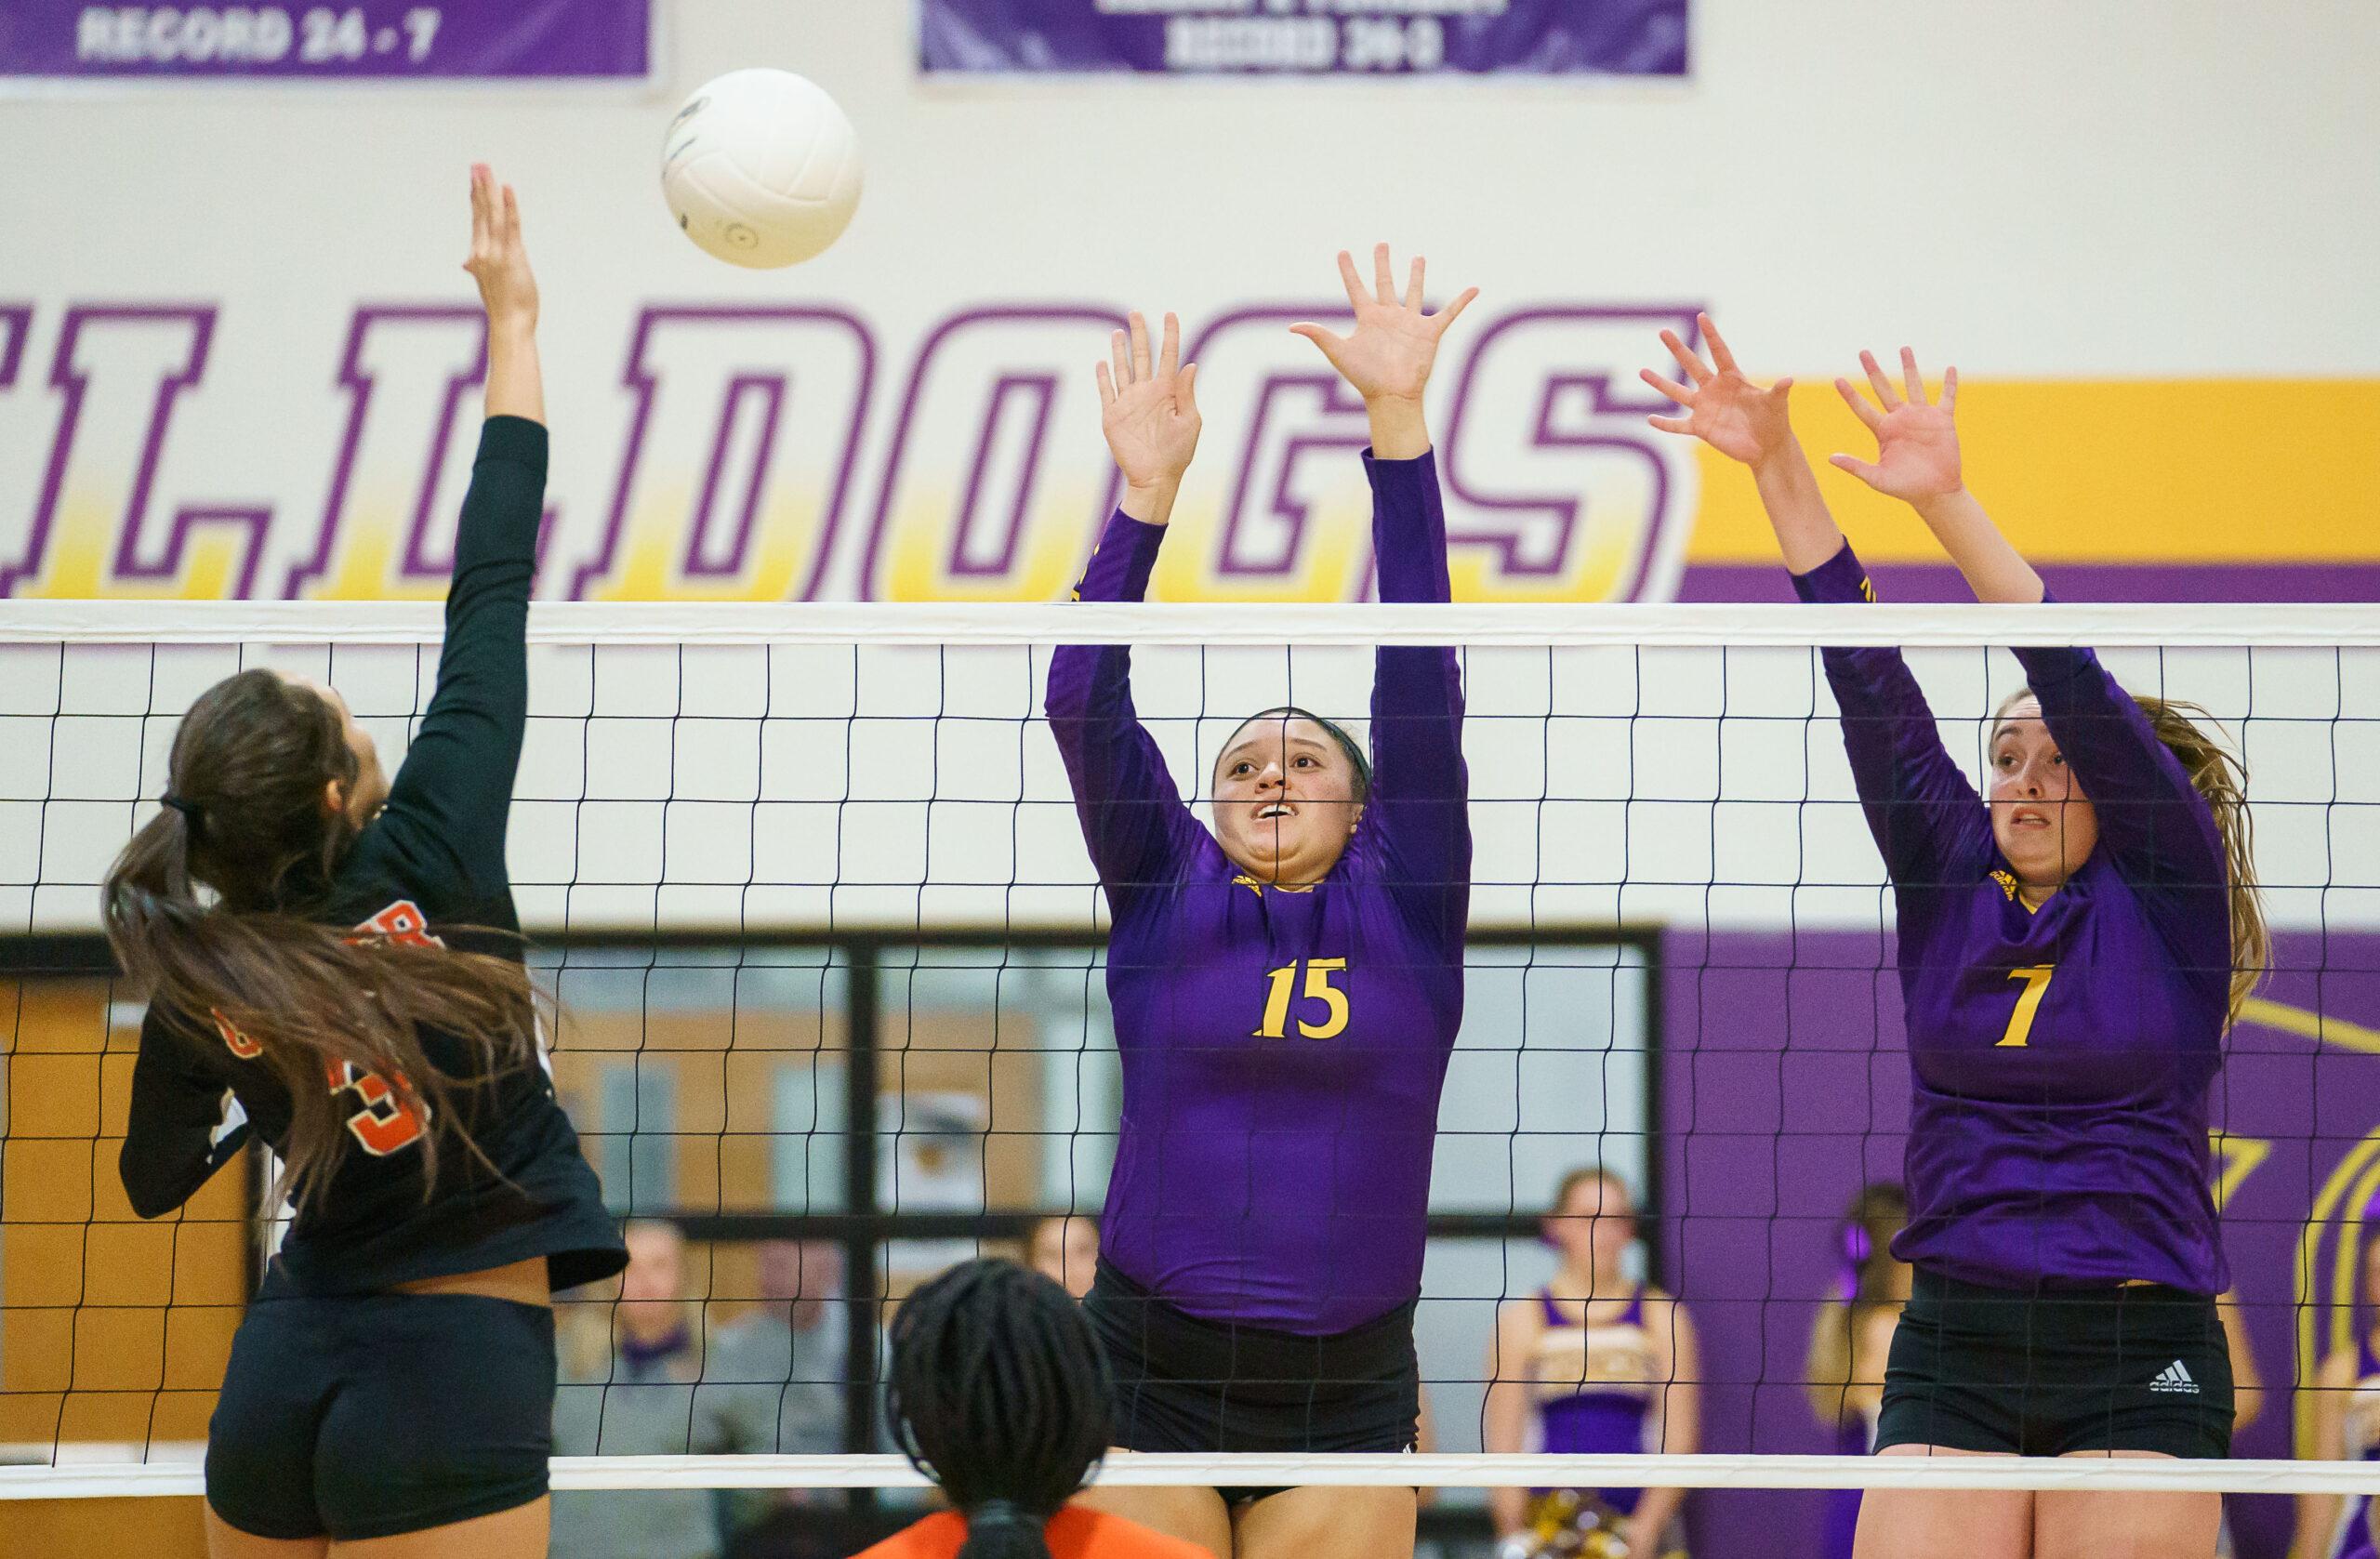 Farmersville starts 2020 among best 4A volleyball teams